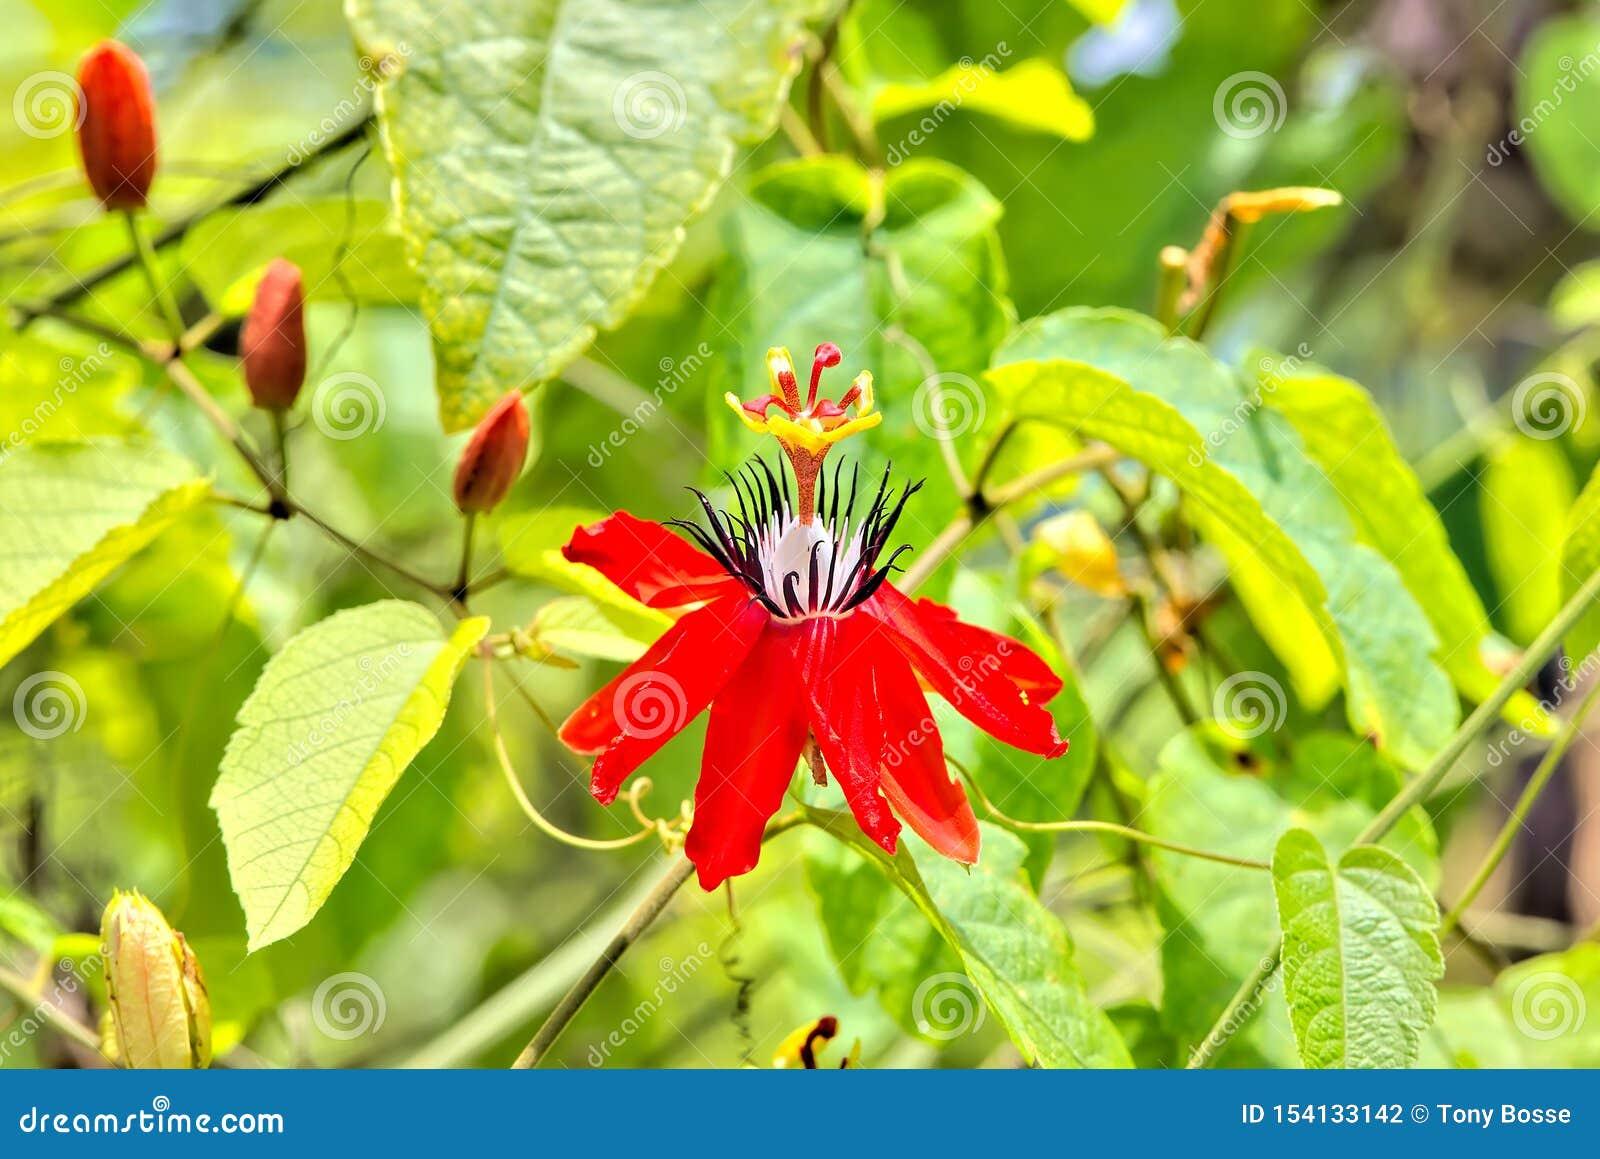 Passiflora Vitifolia Passion Flower